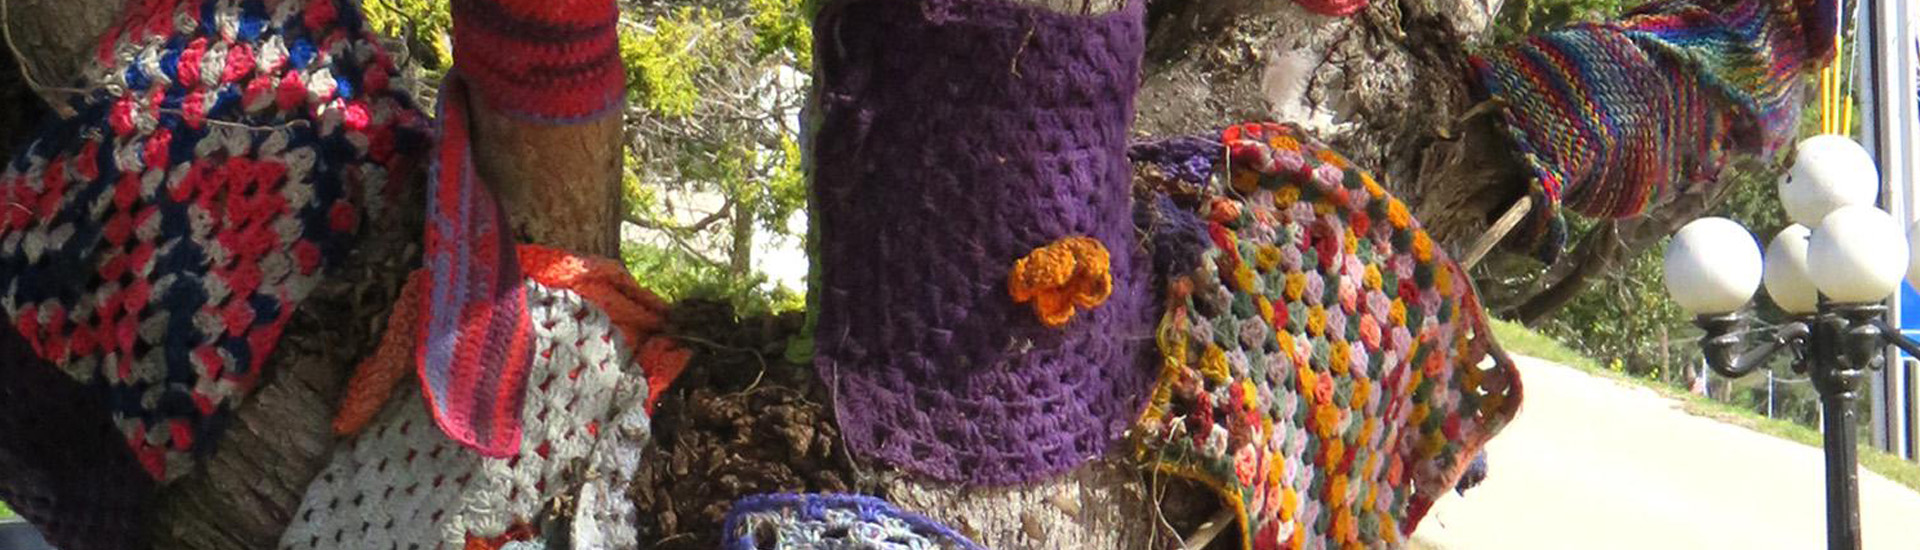 Stitching inspiration this week: Yarnspirations